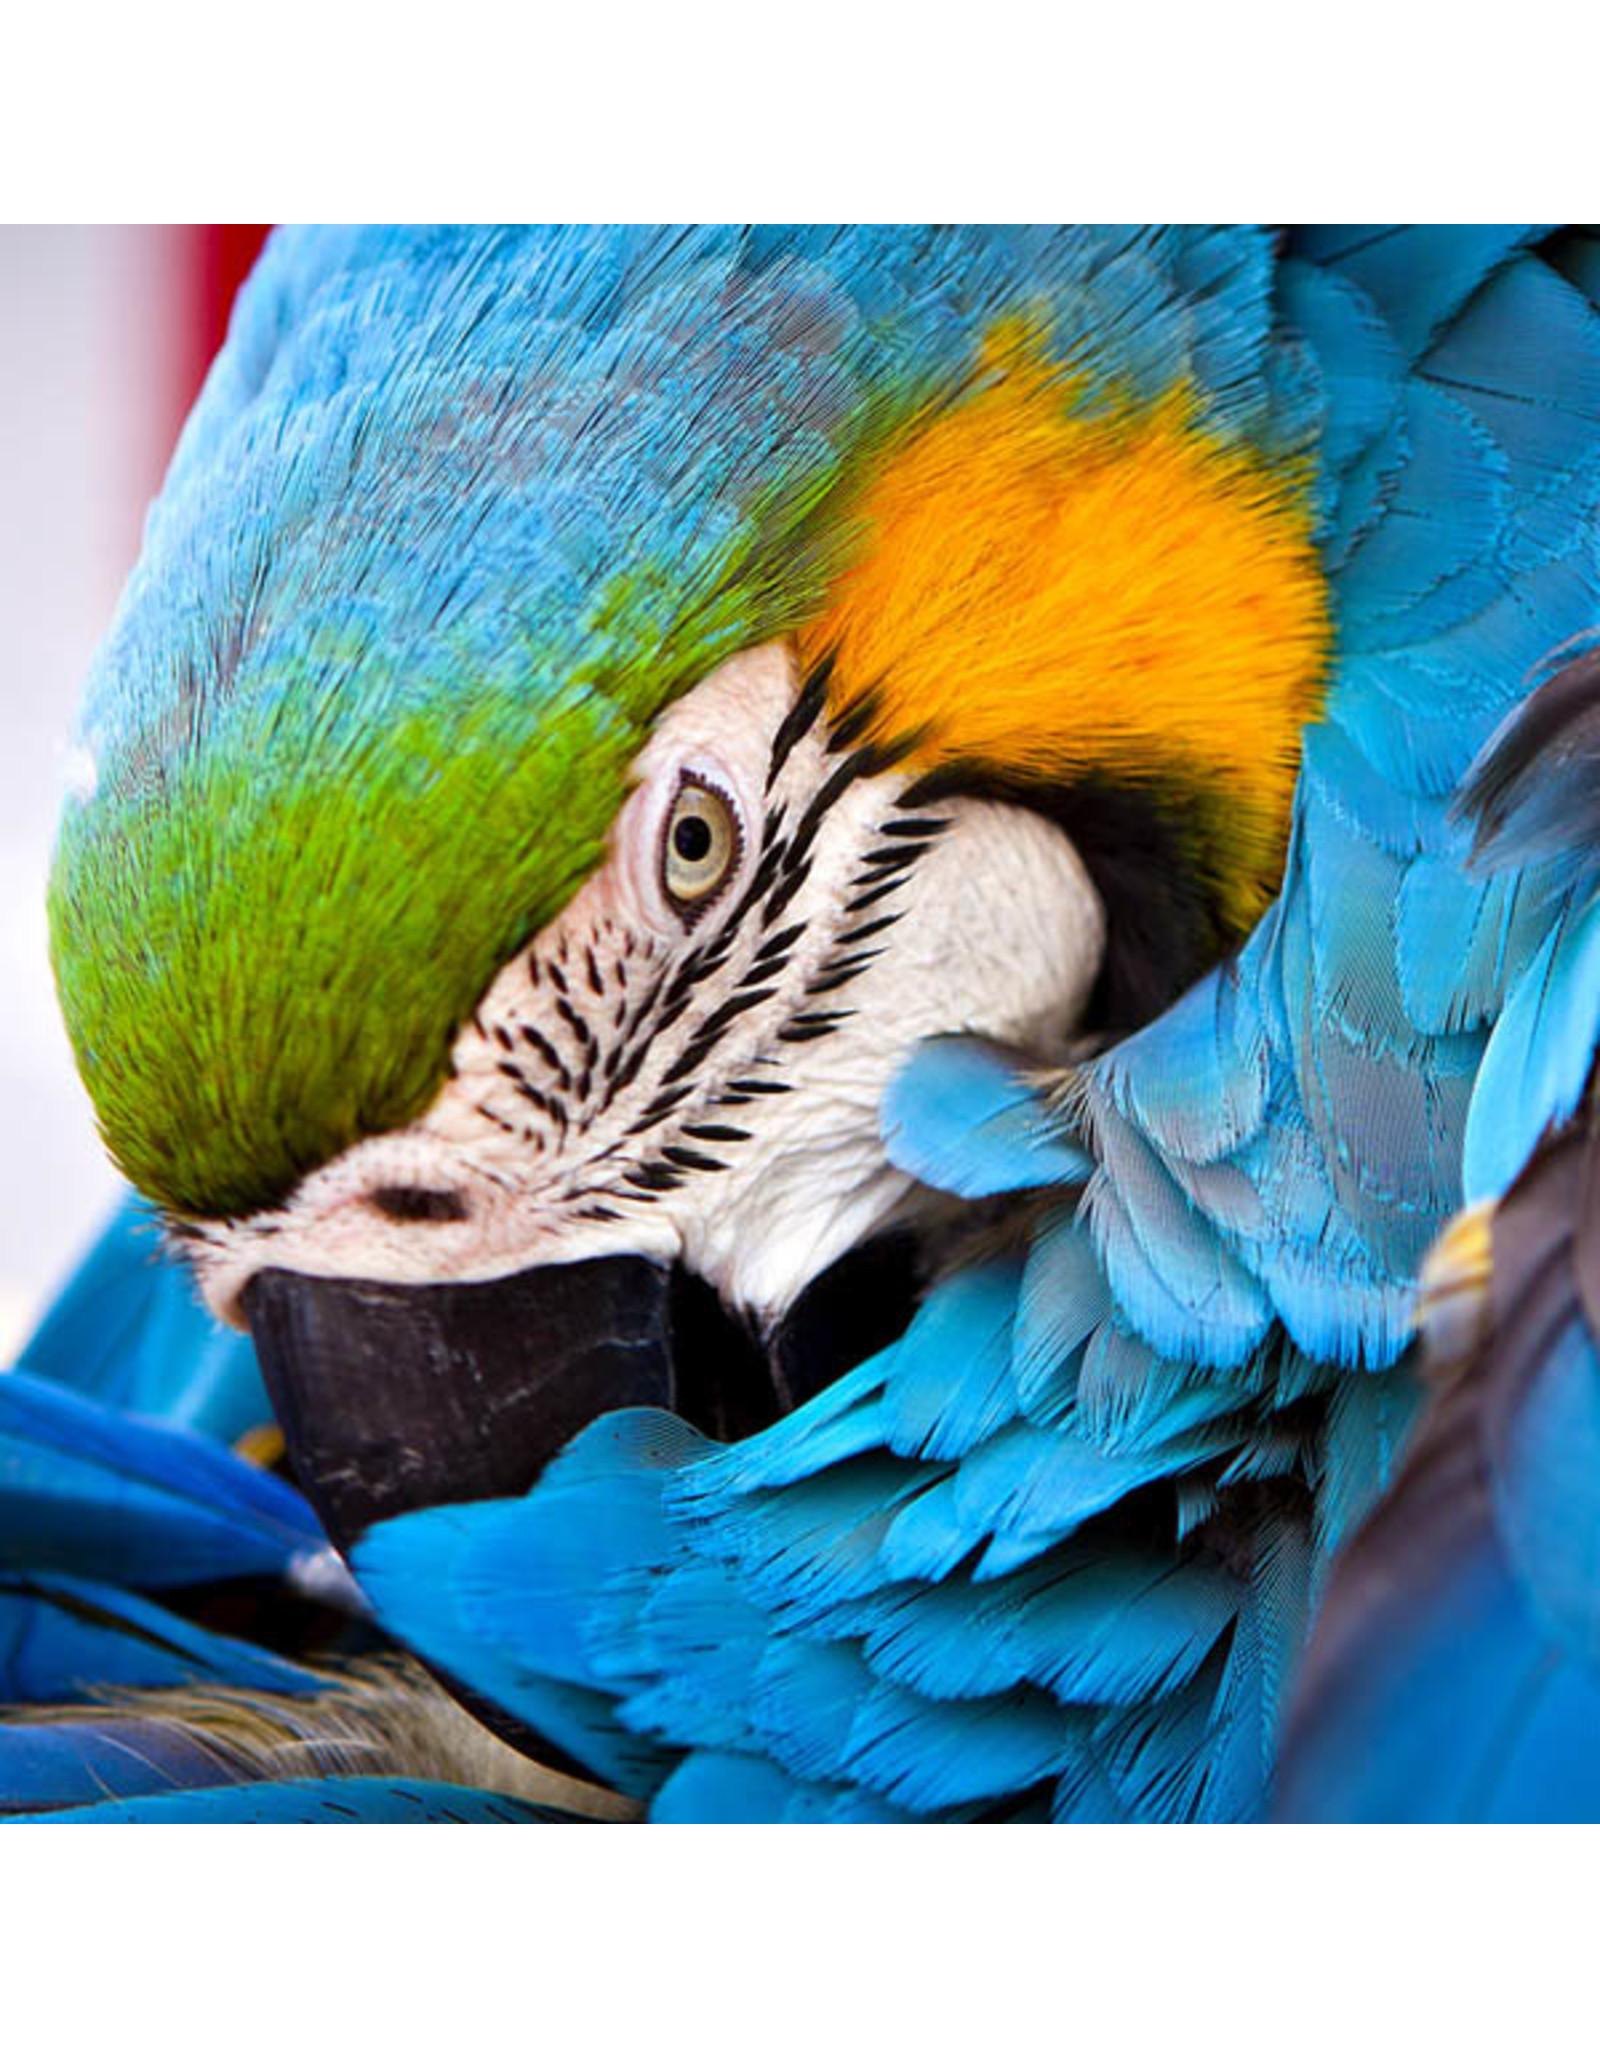 Zen Art & Design Blue Parrot (Sm, 126 Pieces, ZEN Wooden Jigsaw Puzzle)